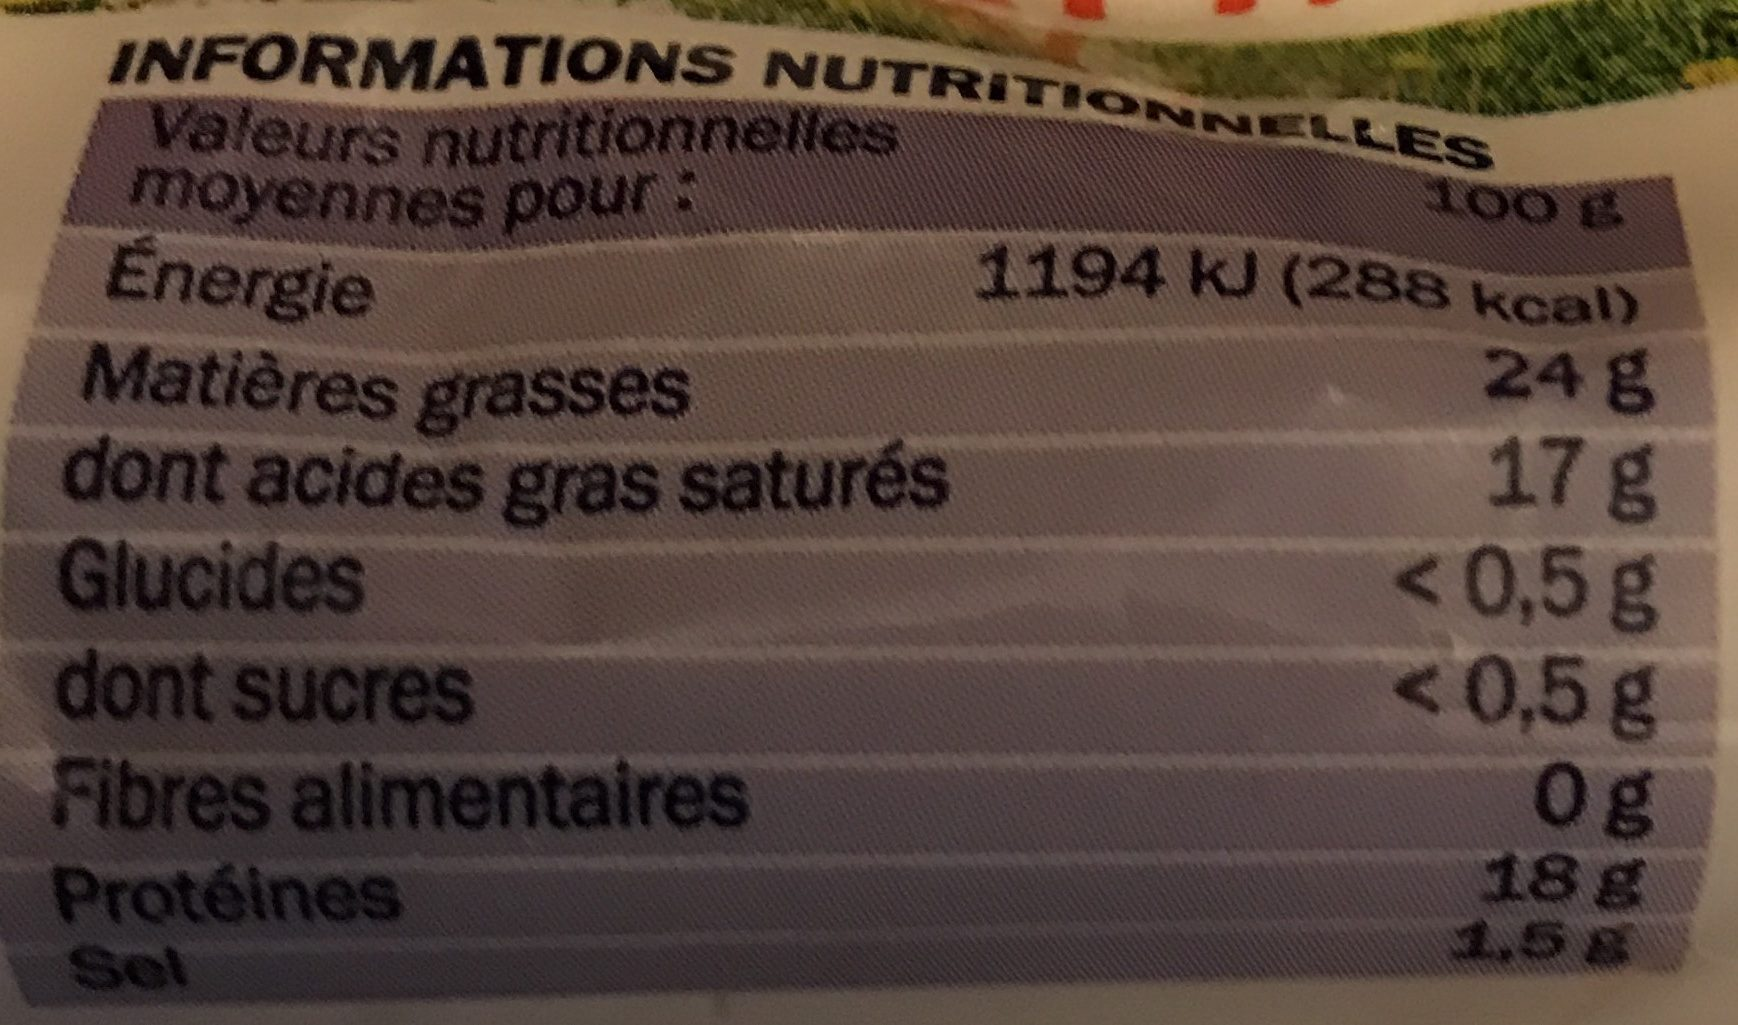 Bûche de chèvre Ste Maure 25% - Voedigswaarden